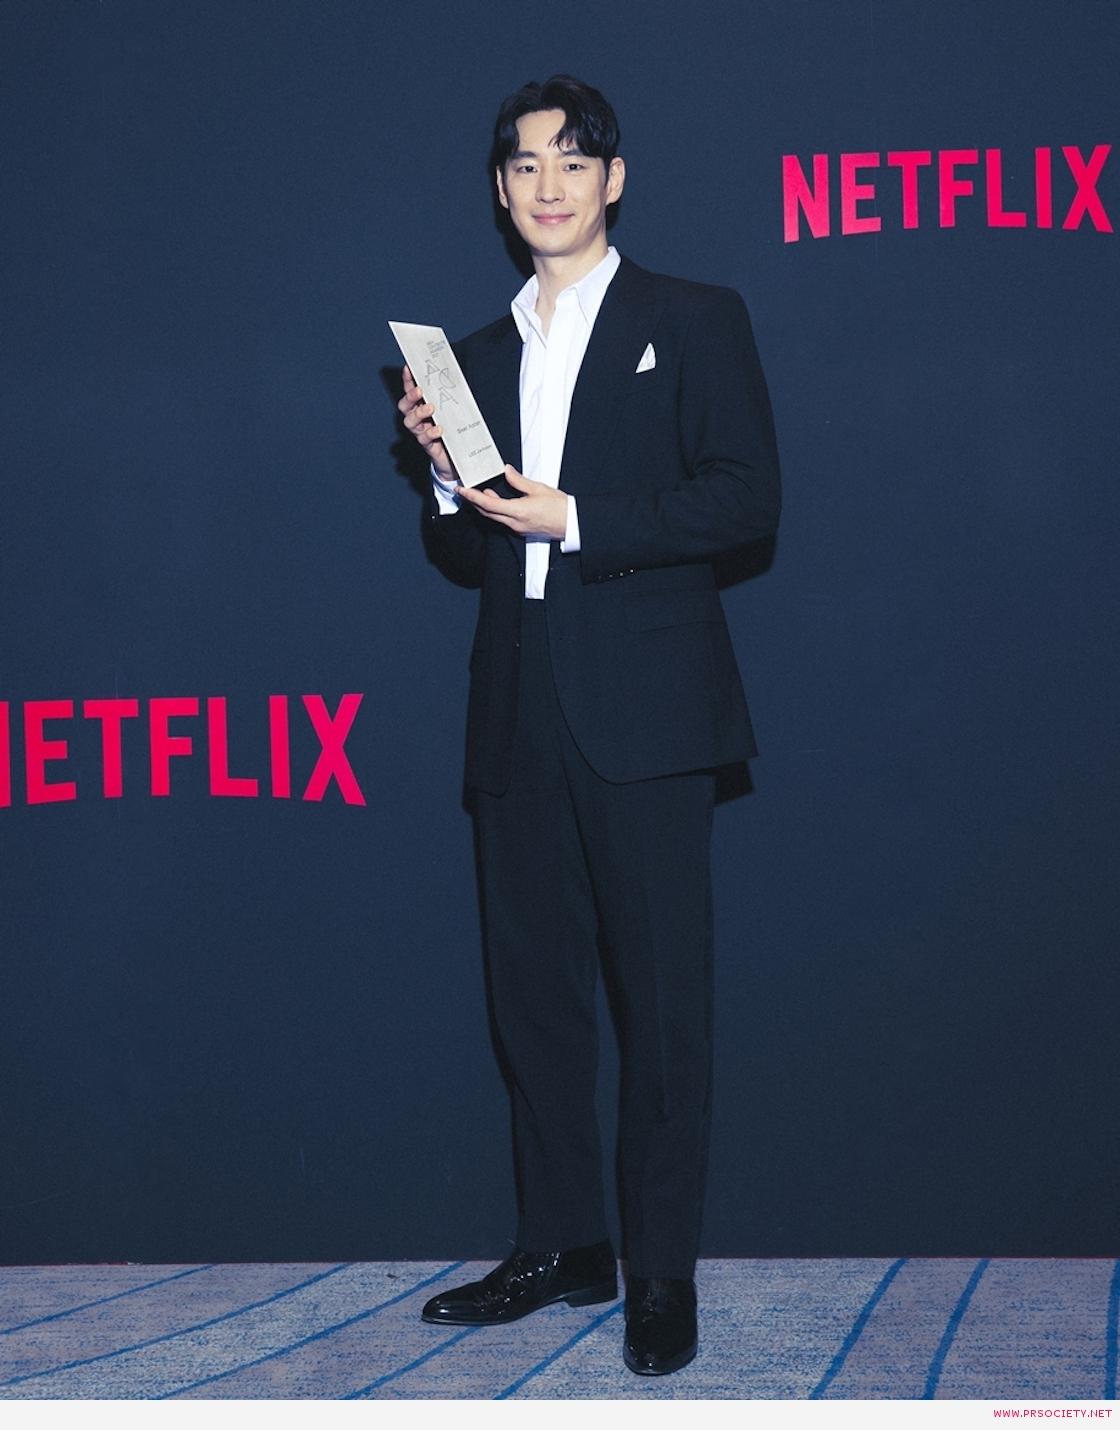 Netflix_Lee Je-hoon2